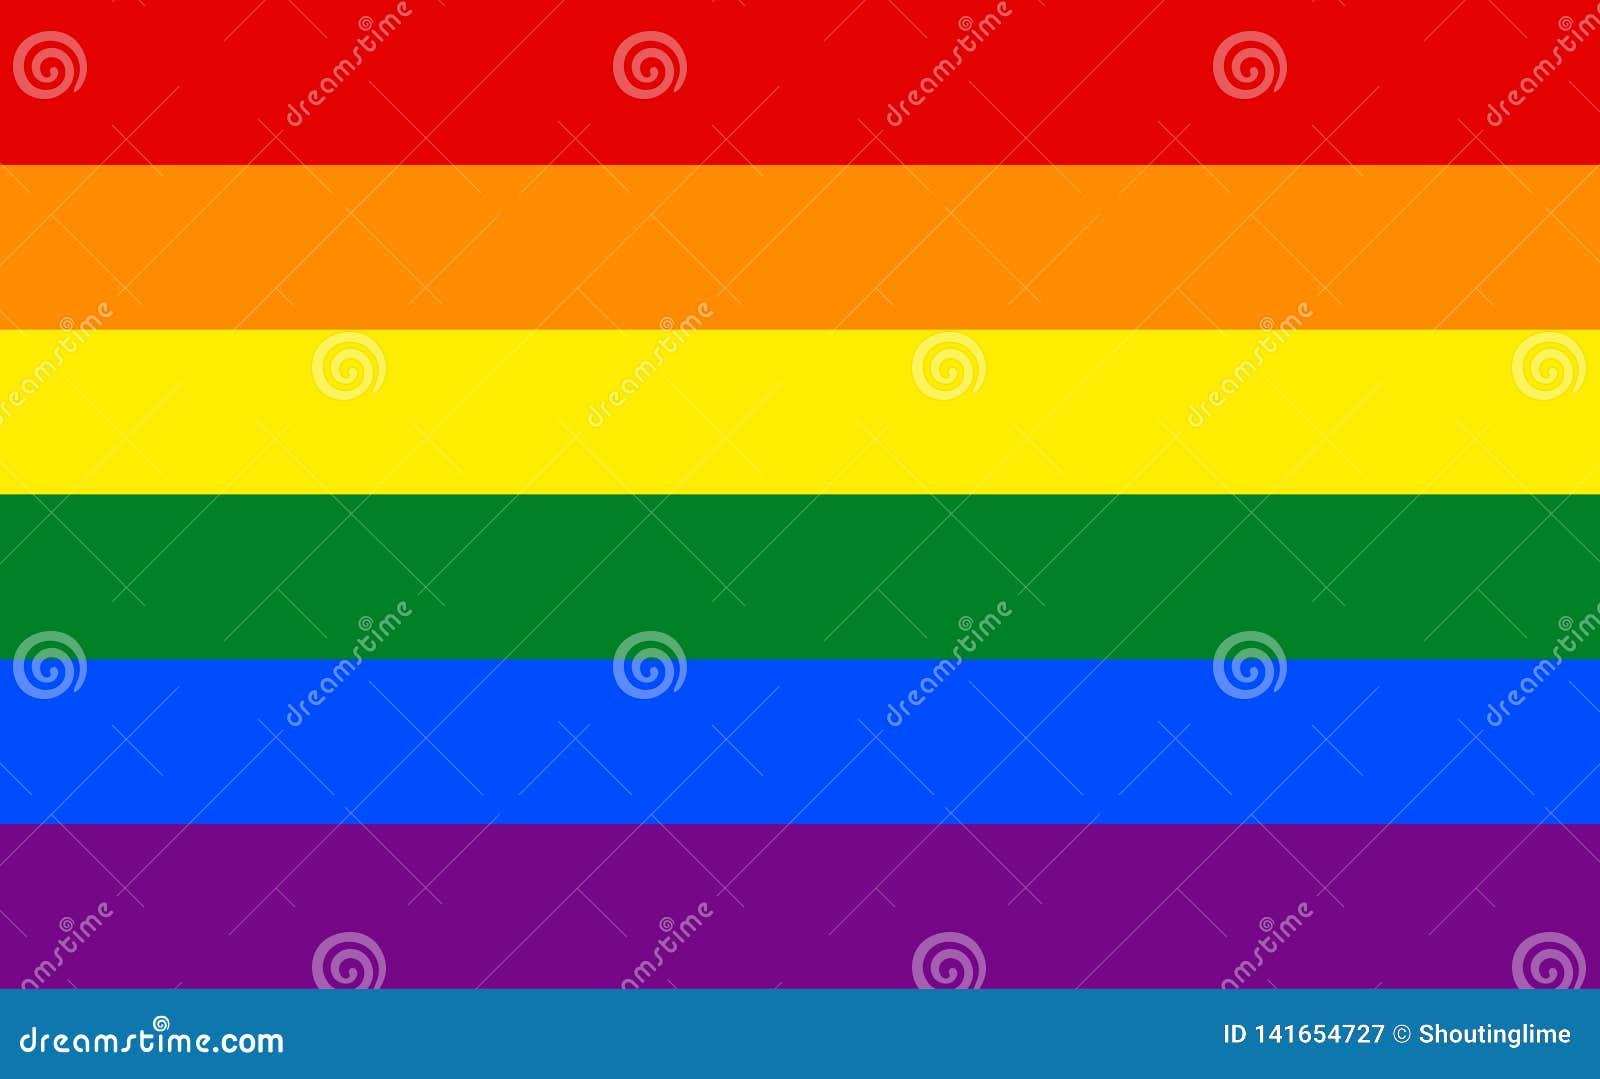 LGBT rainbow flag isolate banner print flat